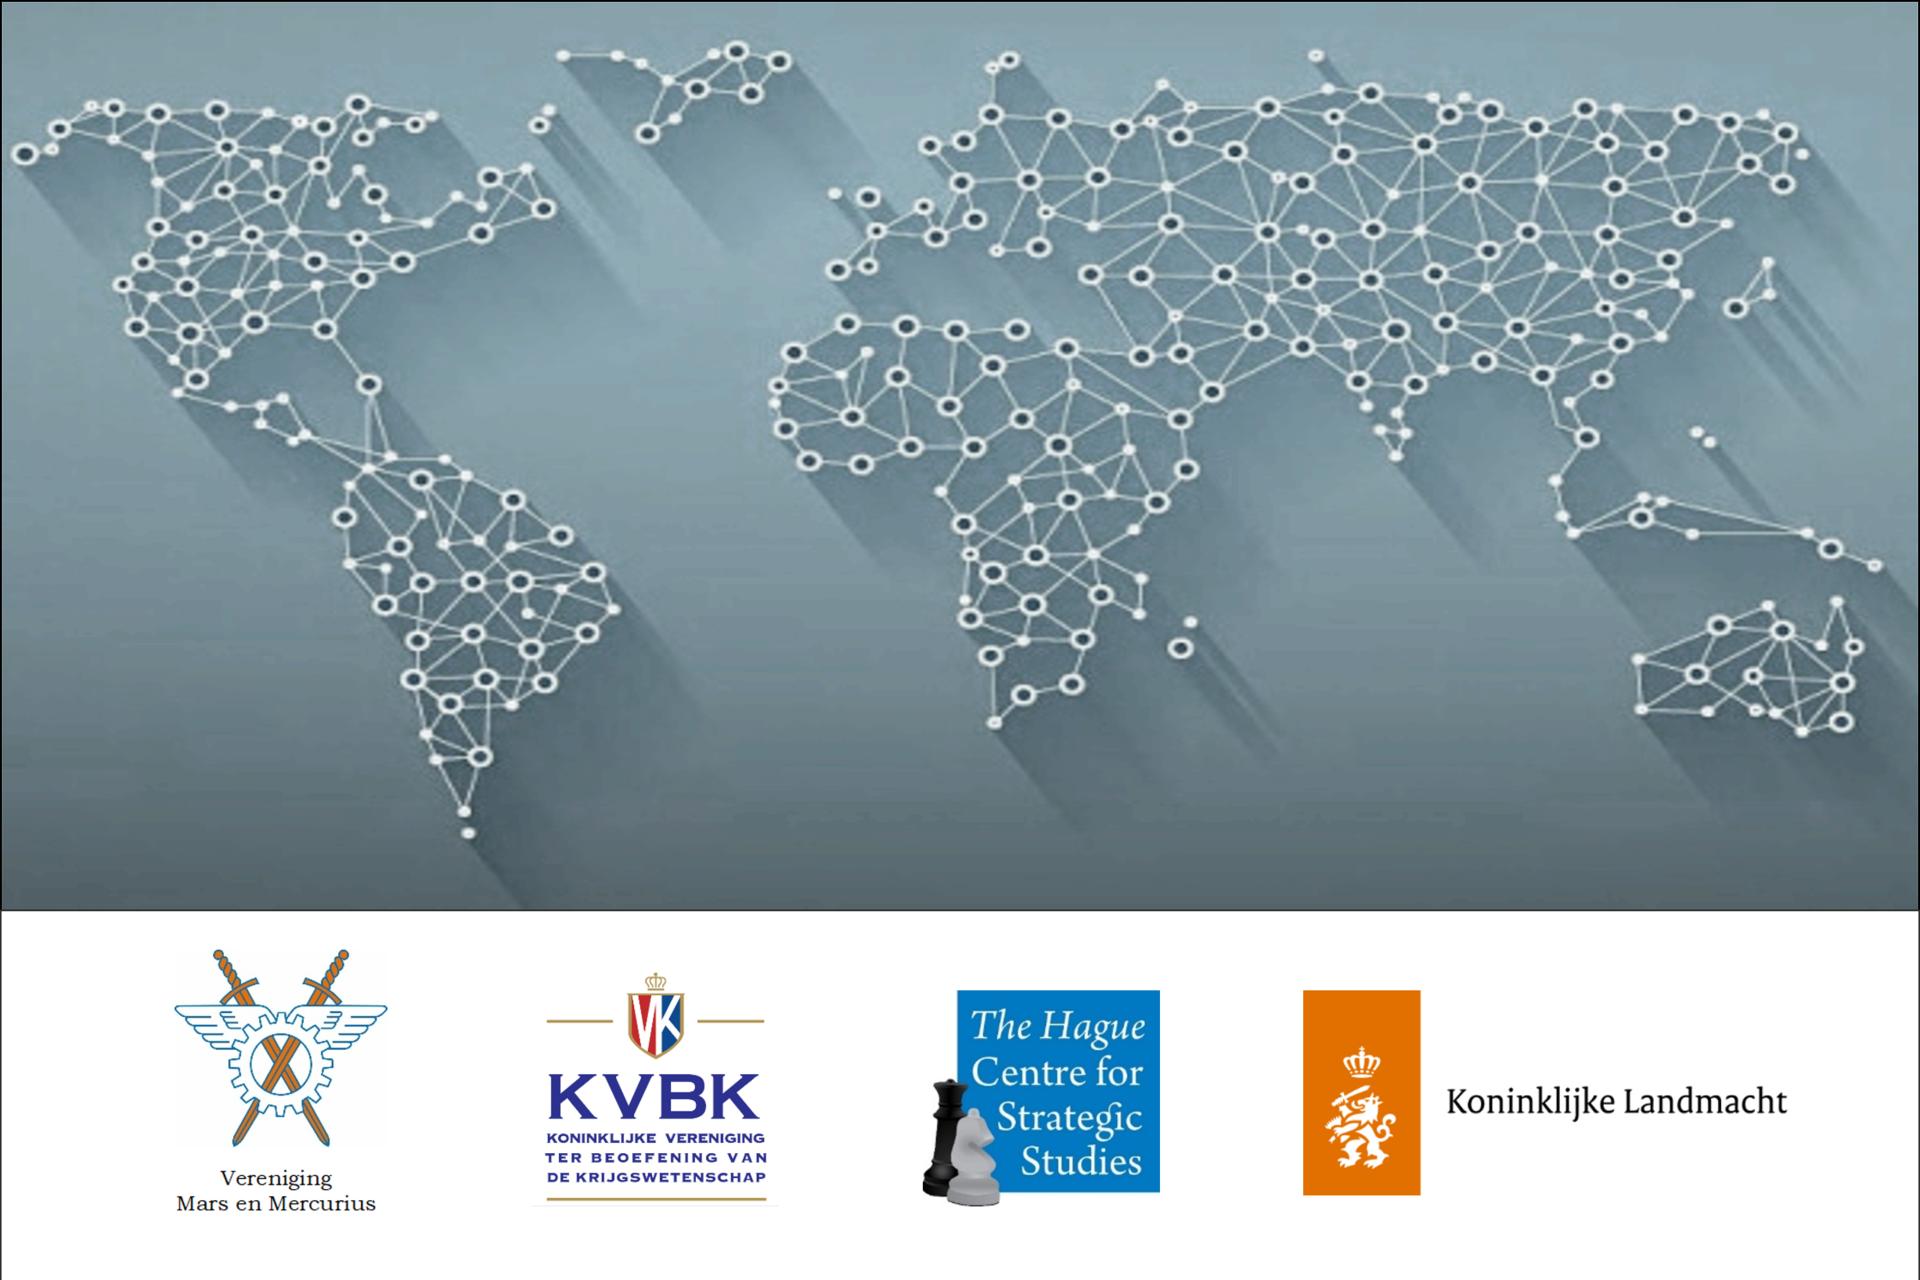 Logo's Mars en Mercurius, KVBK, HCSS en KL